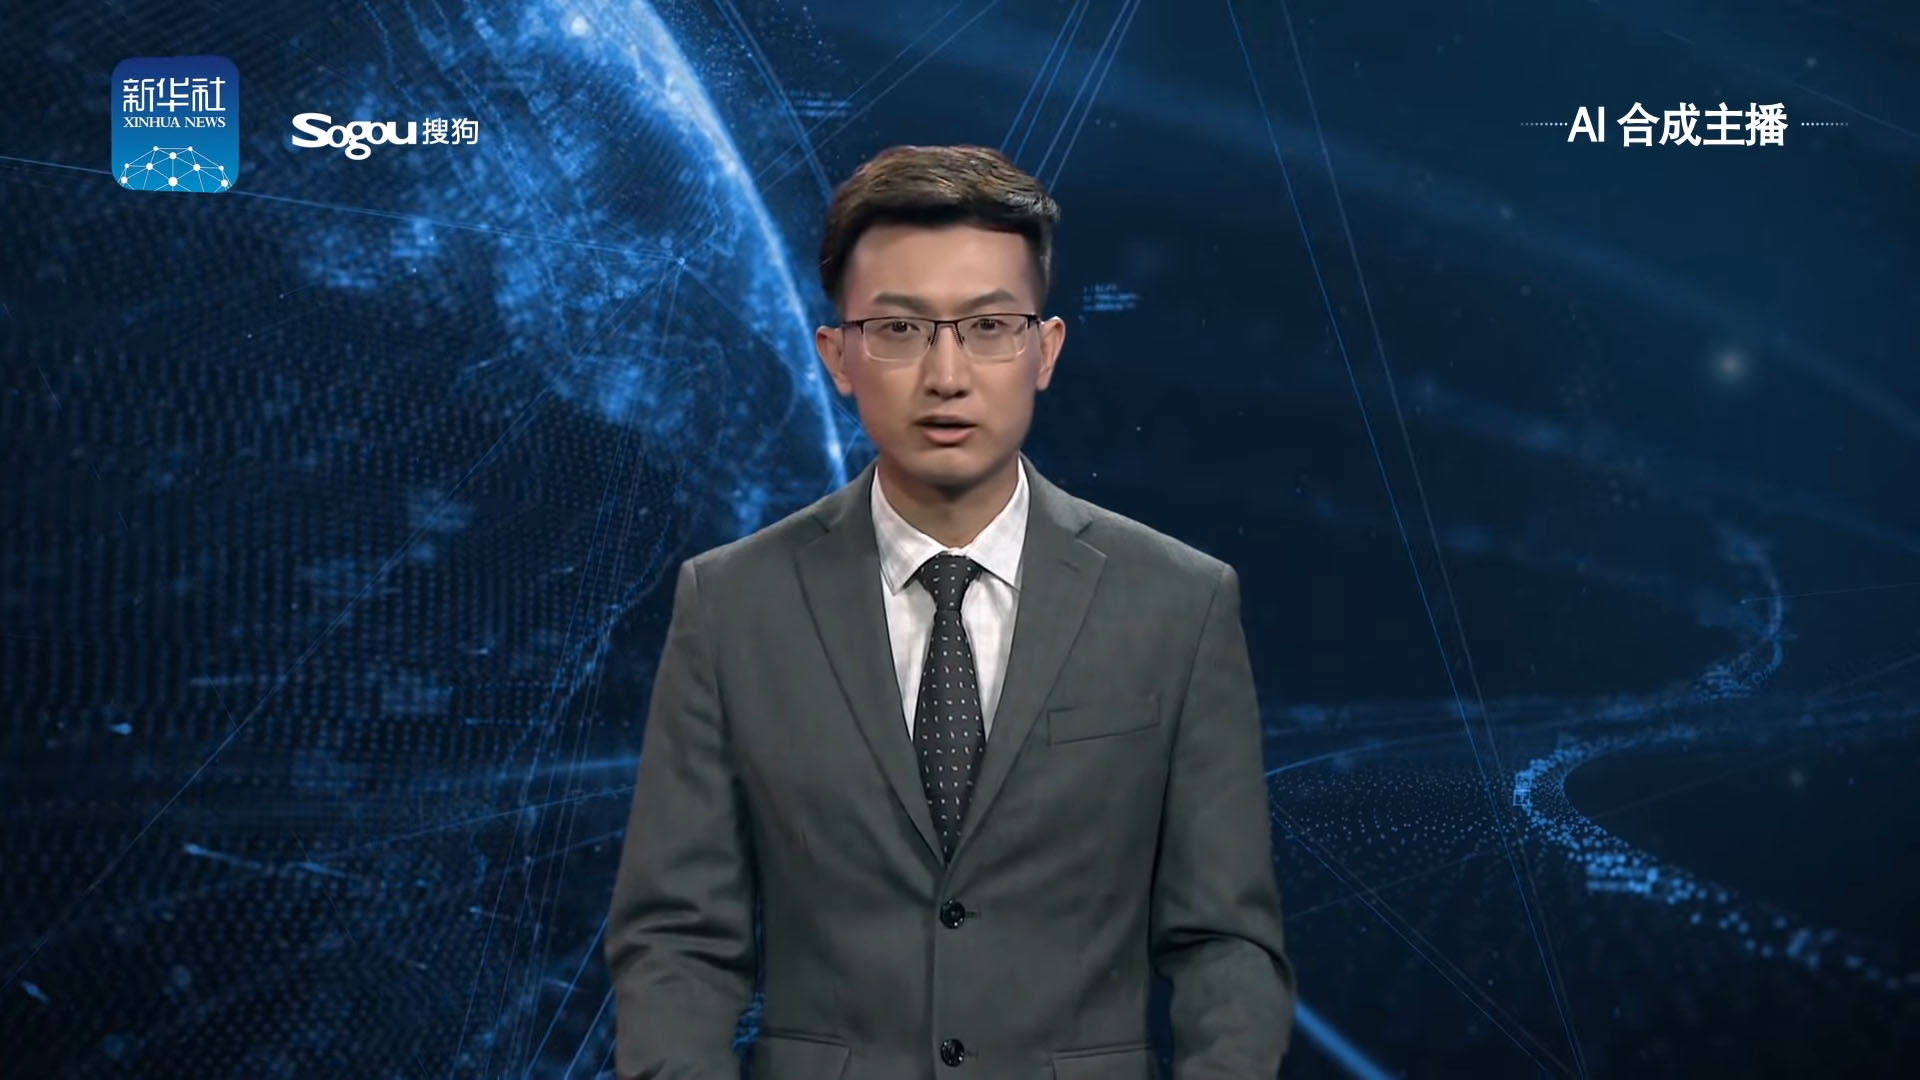 xinhua primo anchorman virtuale ai